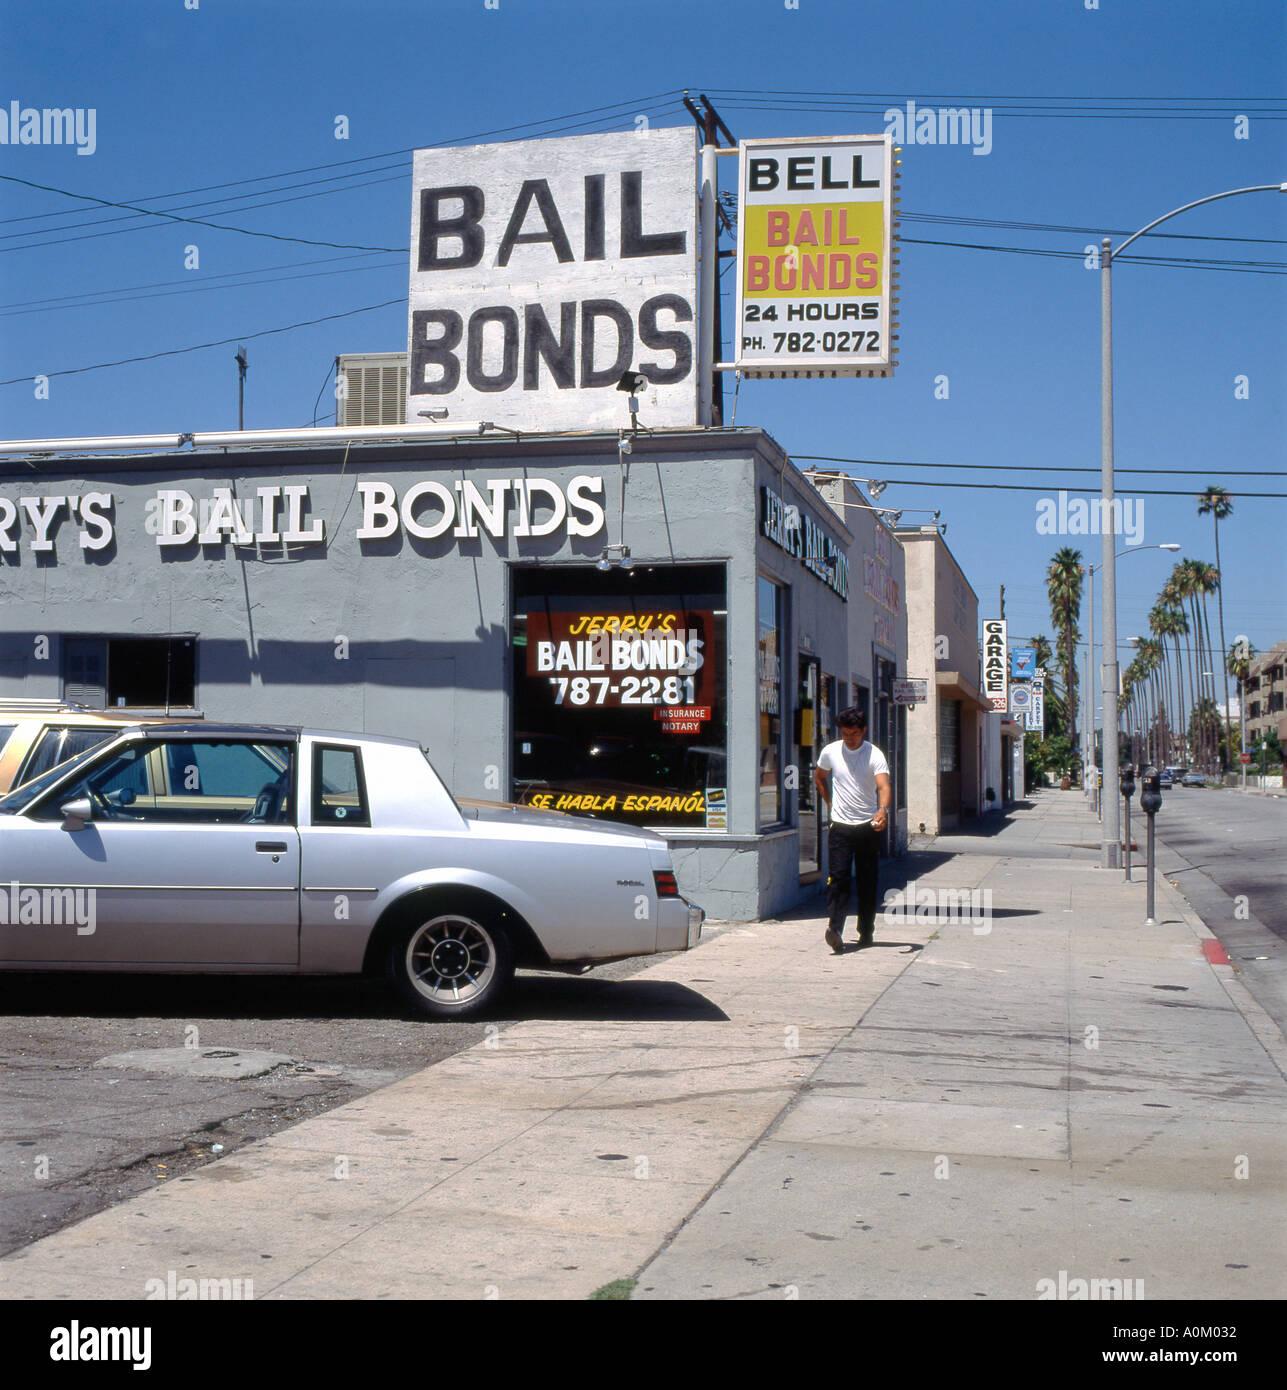 A 1970s car parked outside Jerry's Bail Bonds shop on Santa Monica Boulevard, Los Angeles California USA  KATHY DEWITT - Stock Image